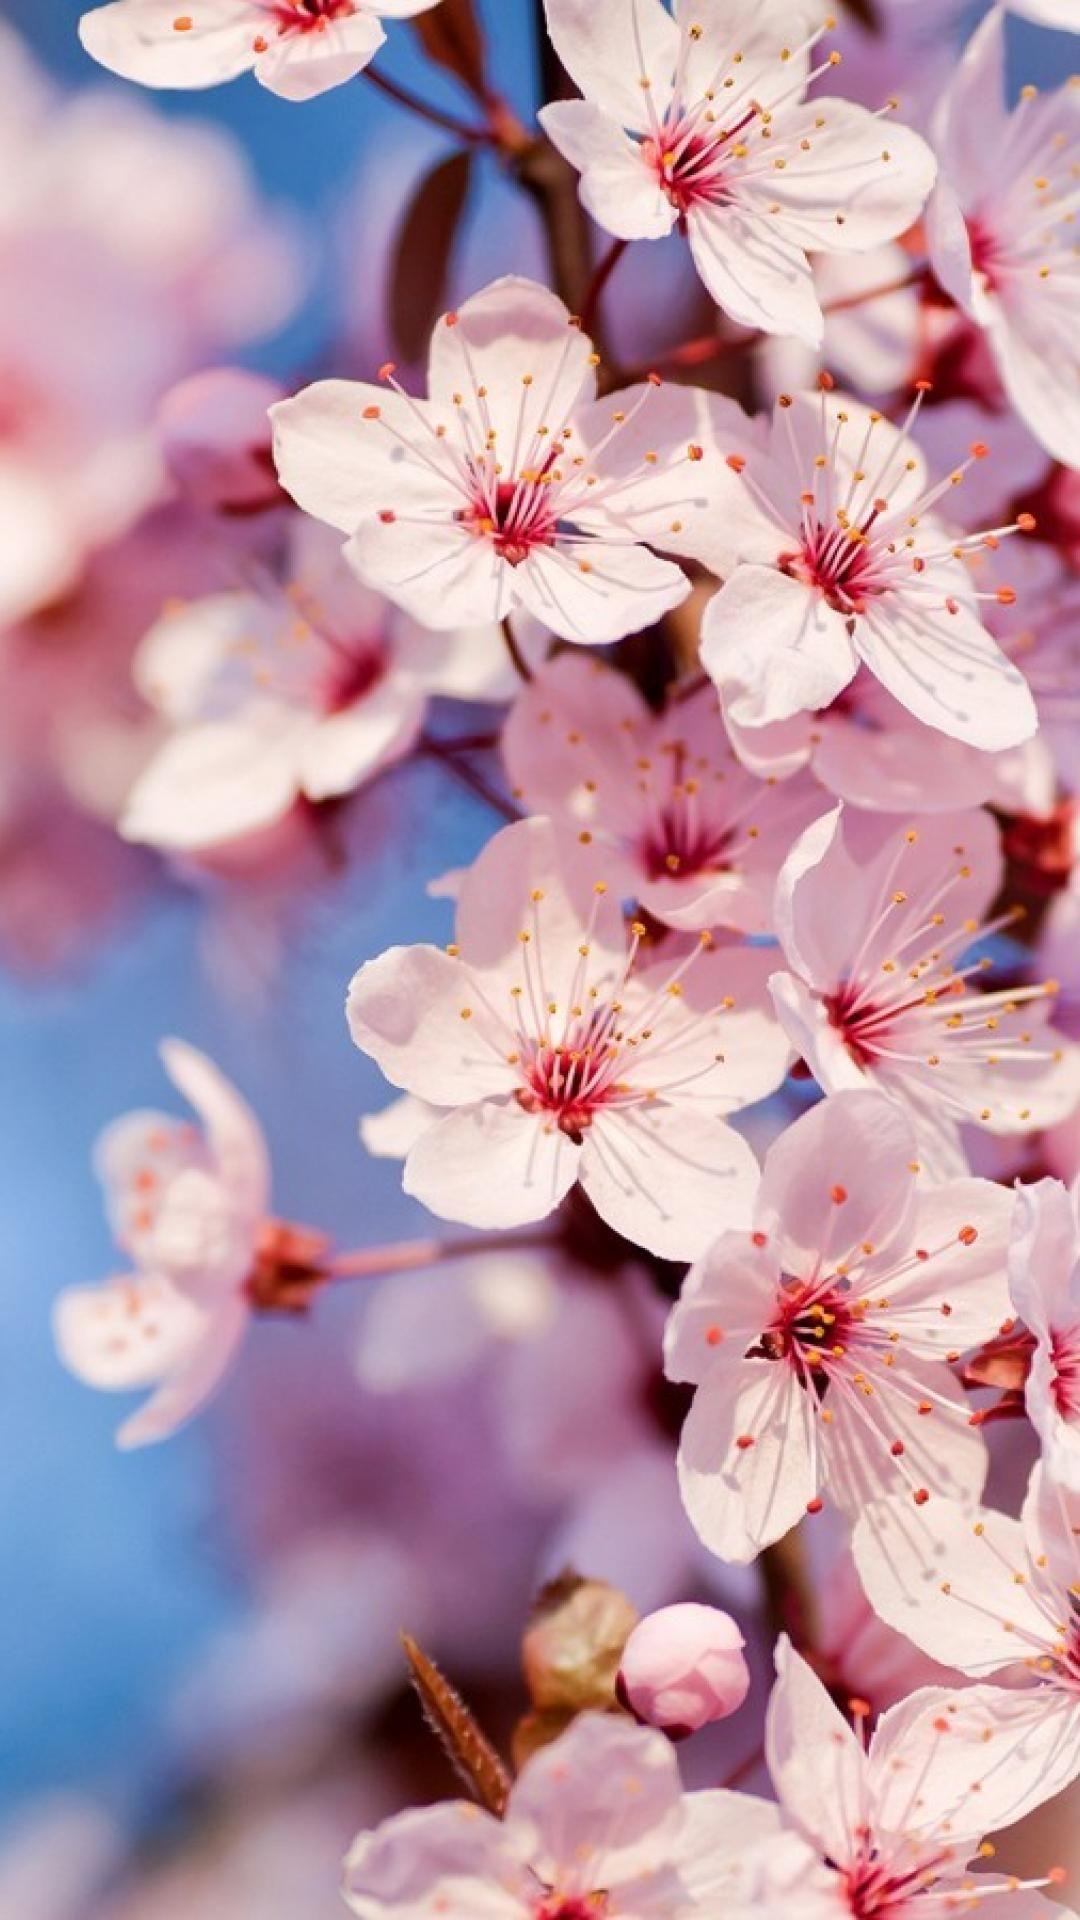 Wall 13 Mobile9 Beautiful Flowers Blossom Trees Sakura Cherry Blossom